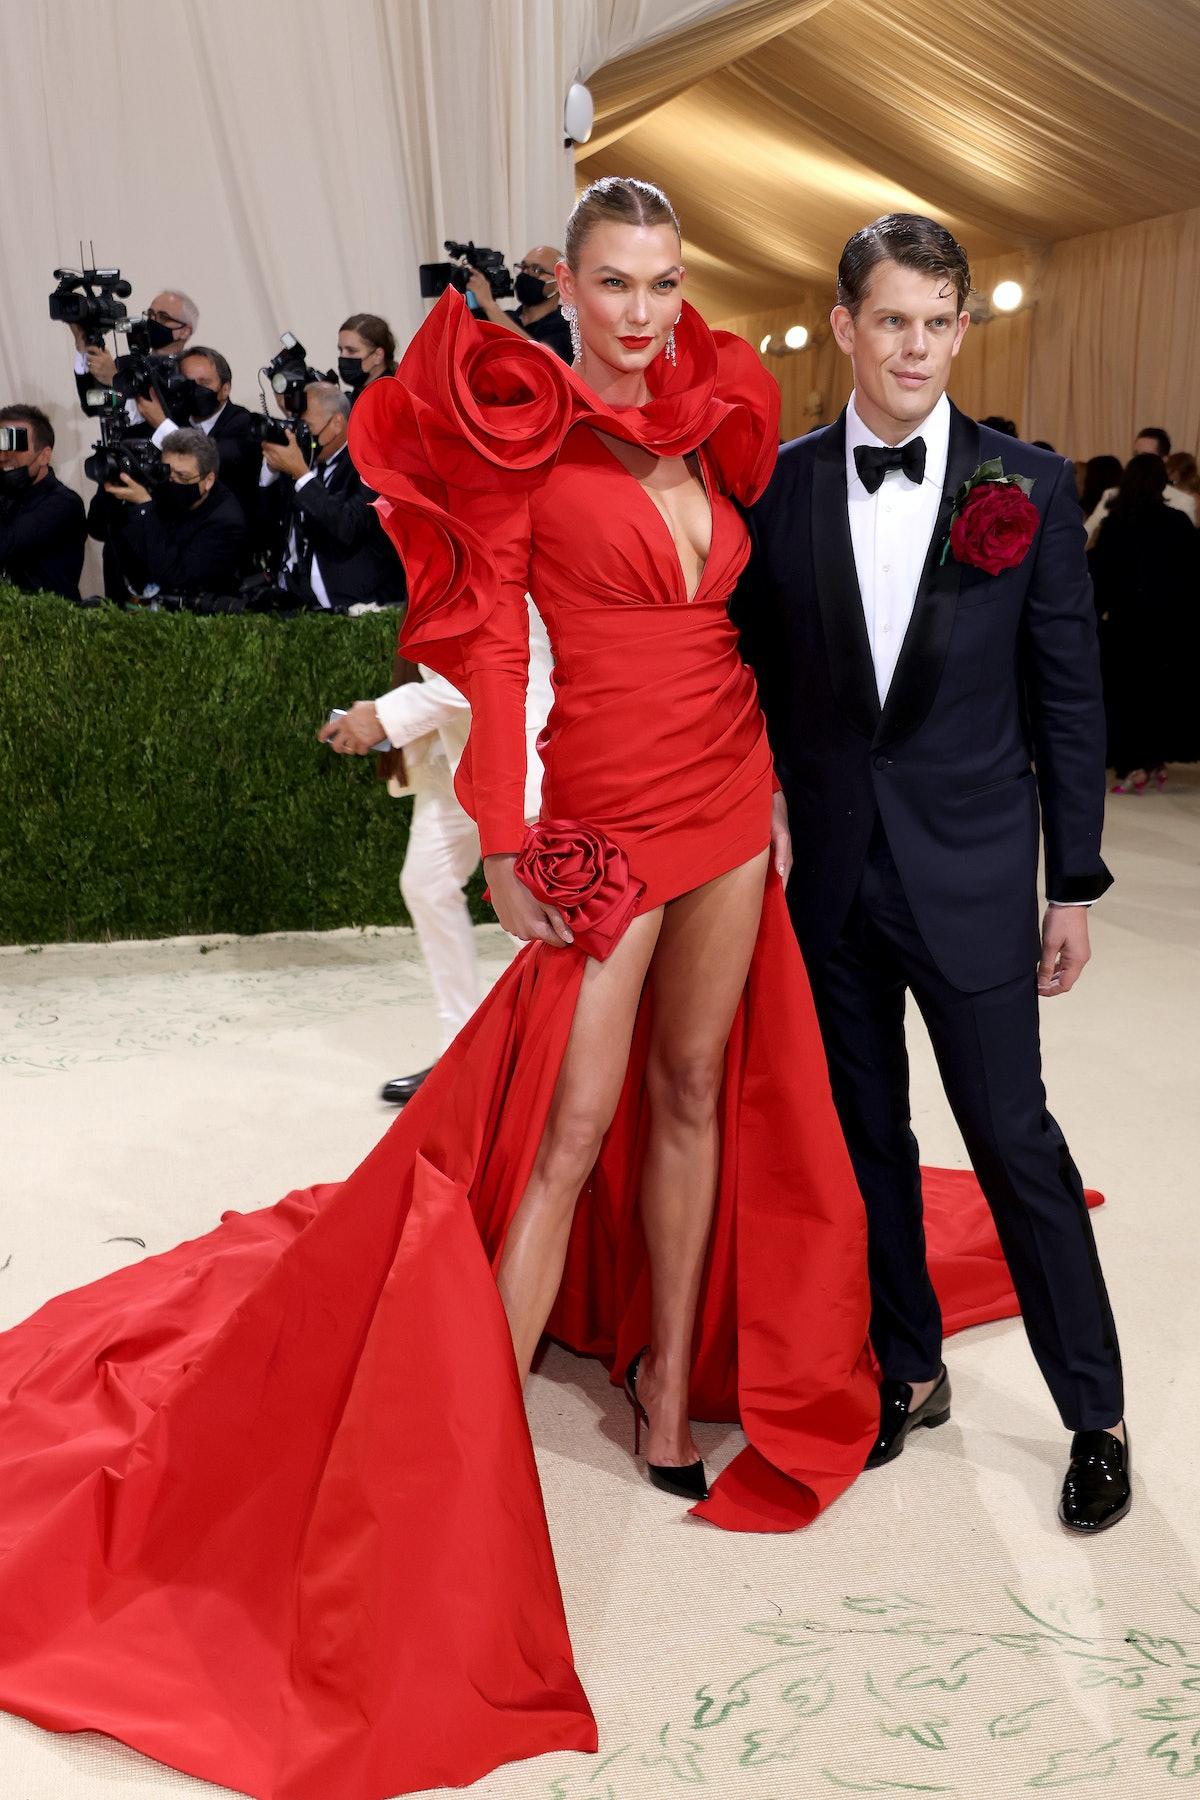 Karlie Kloss and designer Wes Gordon attend The 2021 Met Gala